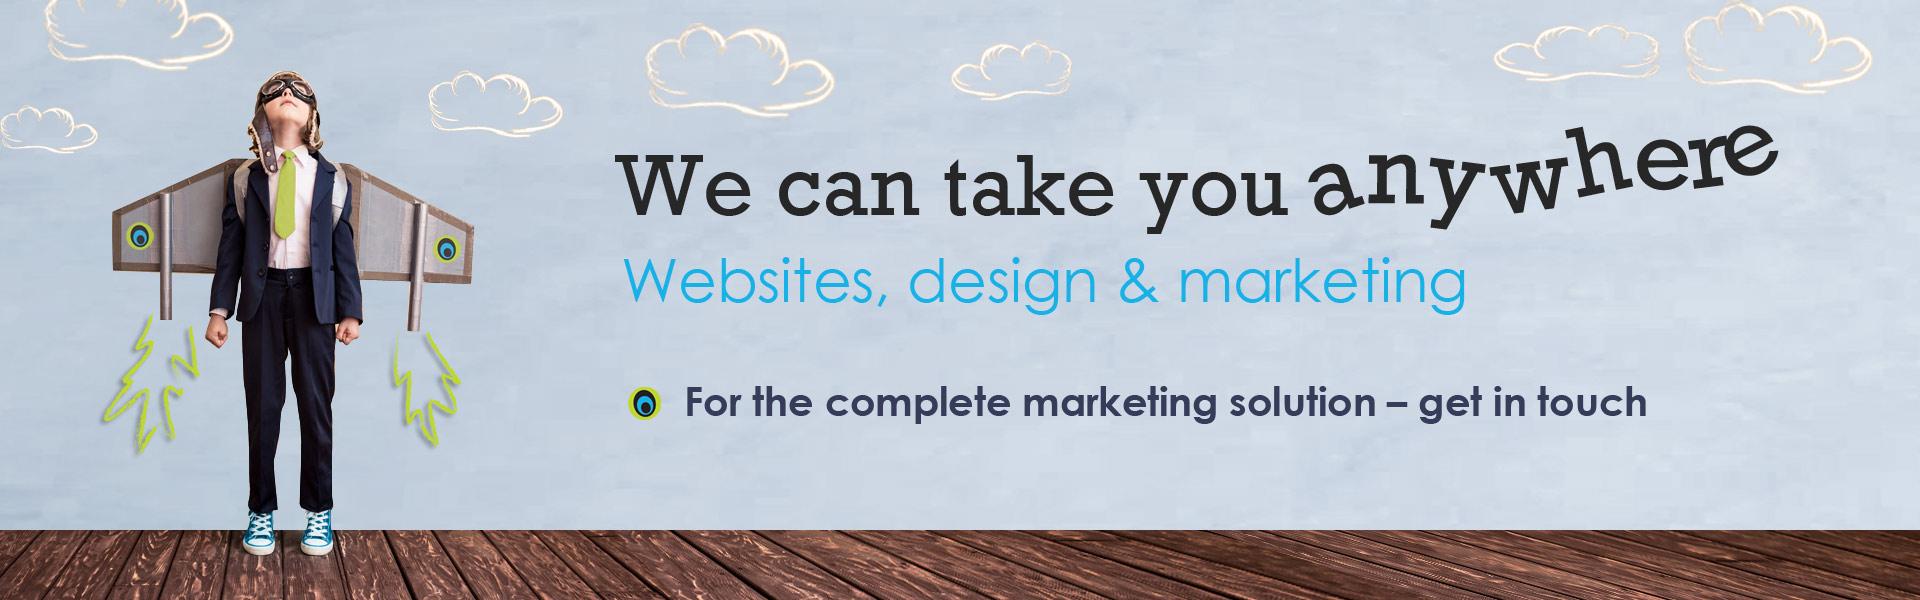 Marketing Zone: Websites, design & marketing